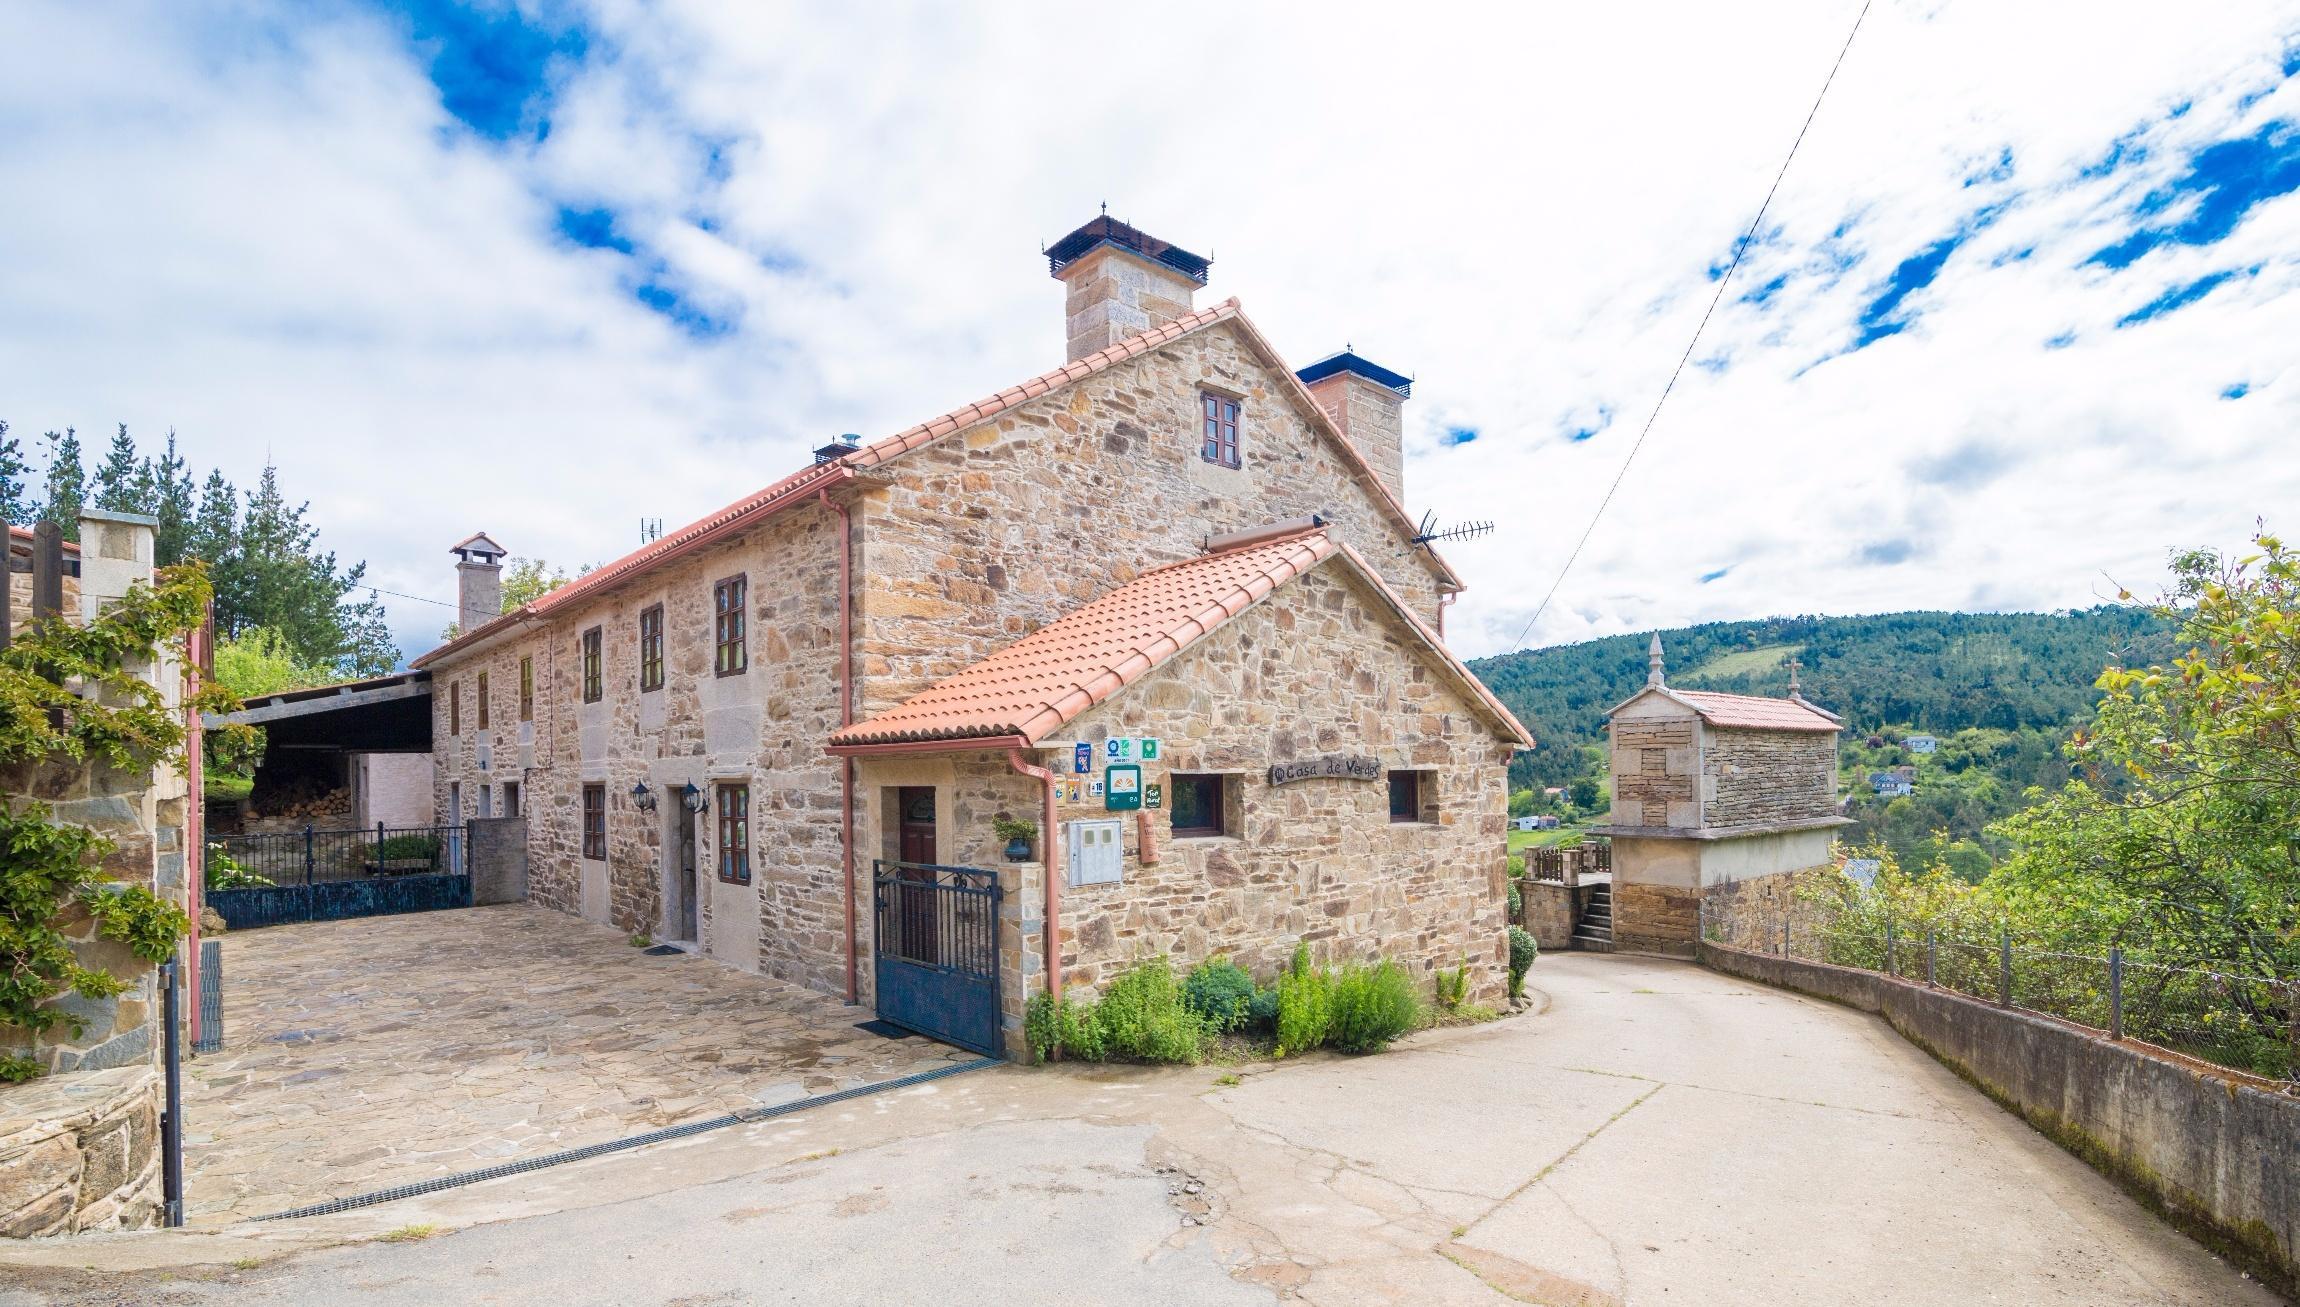 Casas galicia baratas best full size of shrh diseno de sala estar casas modulares precios - Casas rurales lugo baratas ...